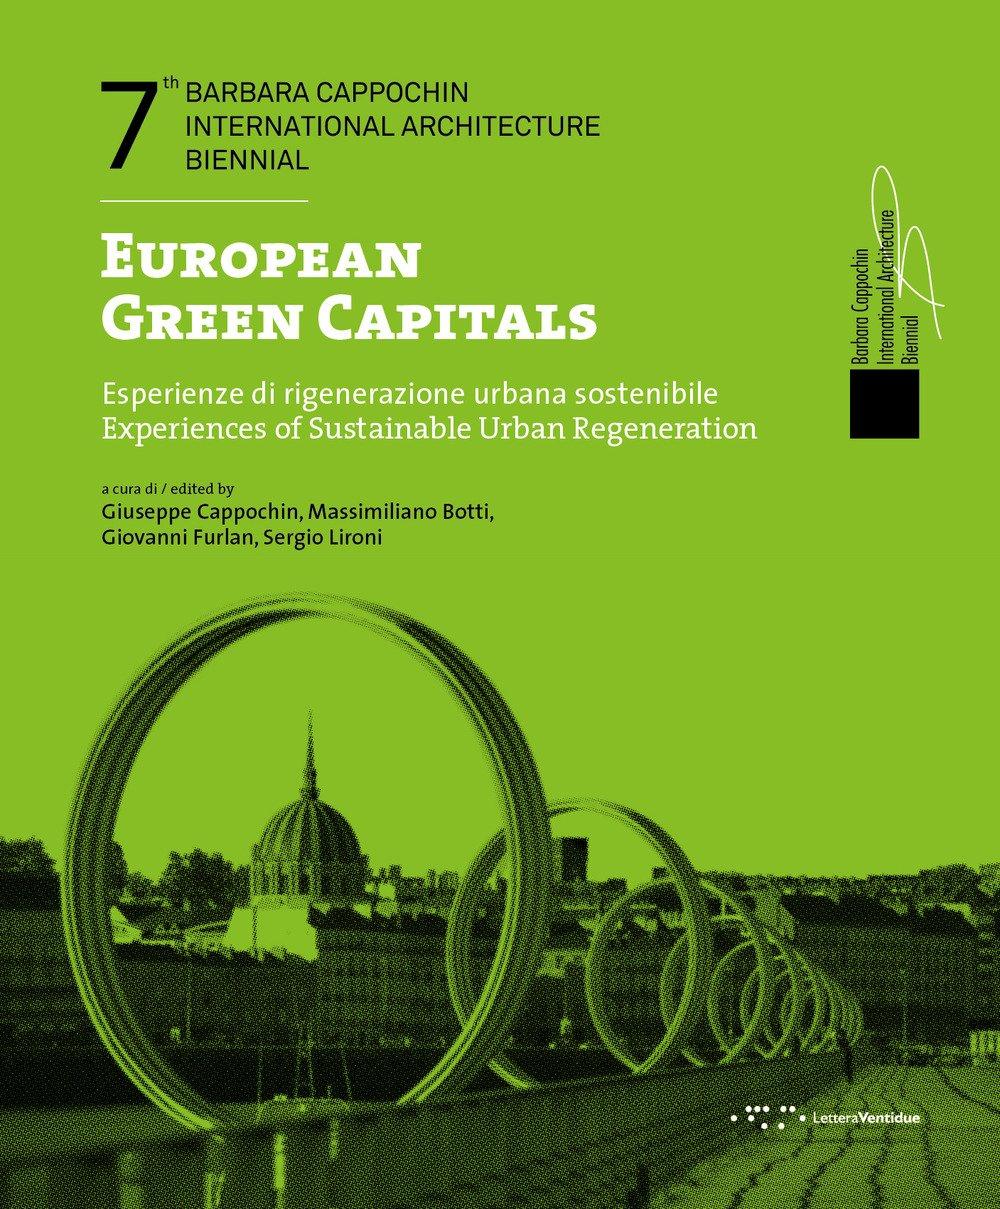 European Green Capitals. Esperienze di rigenerazione urbana sostenibile